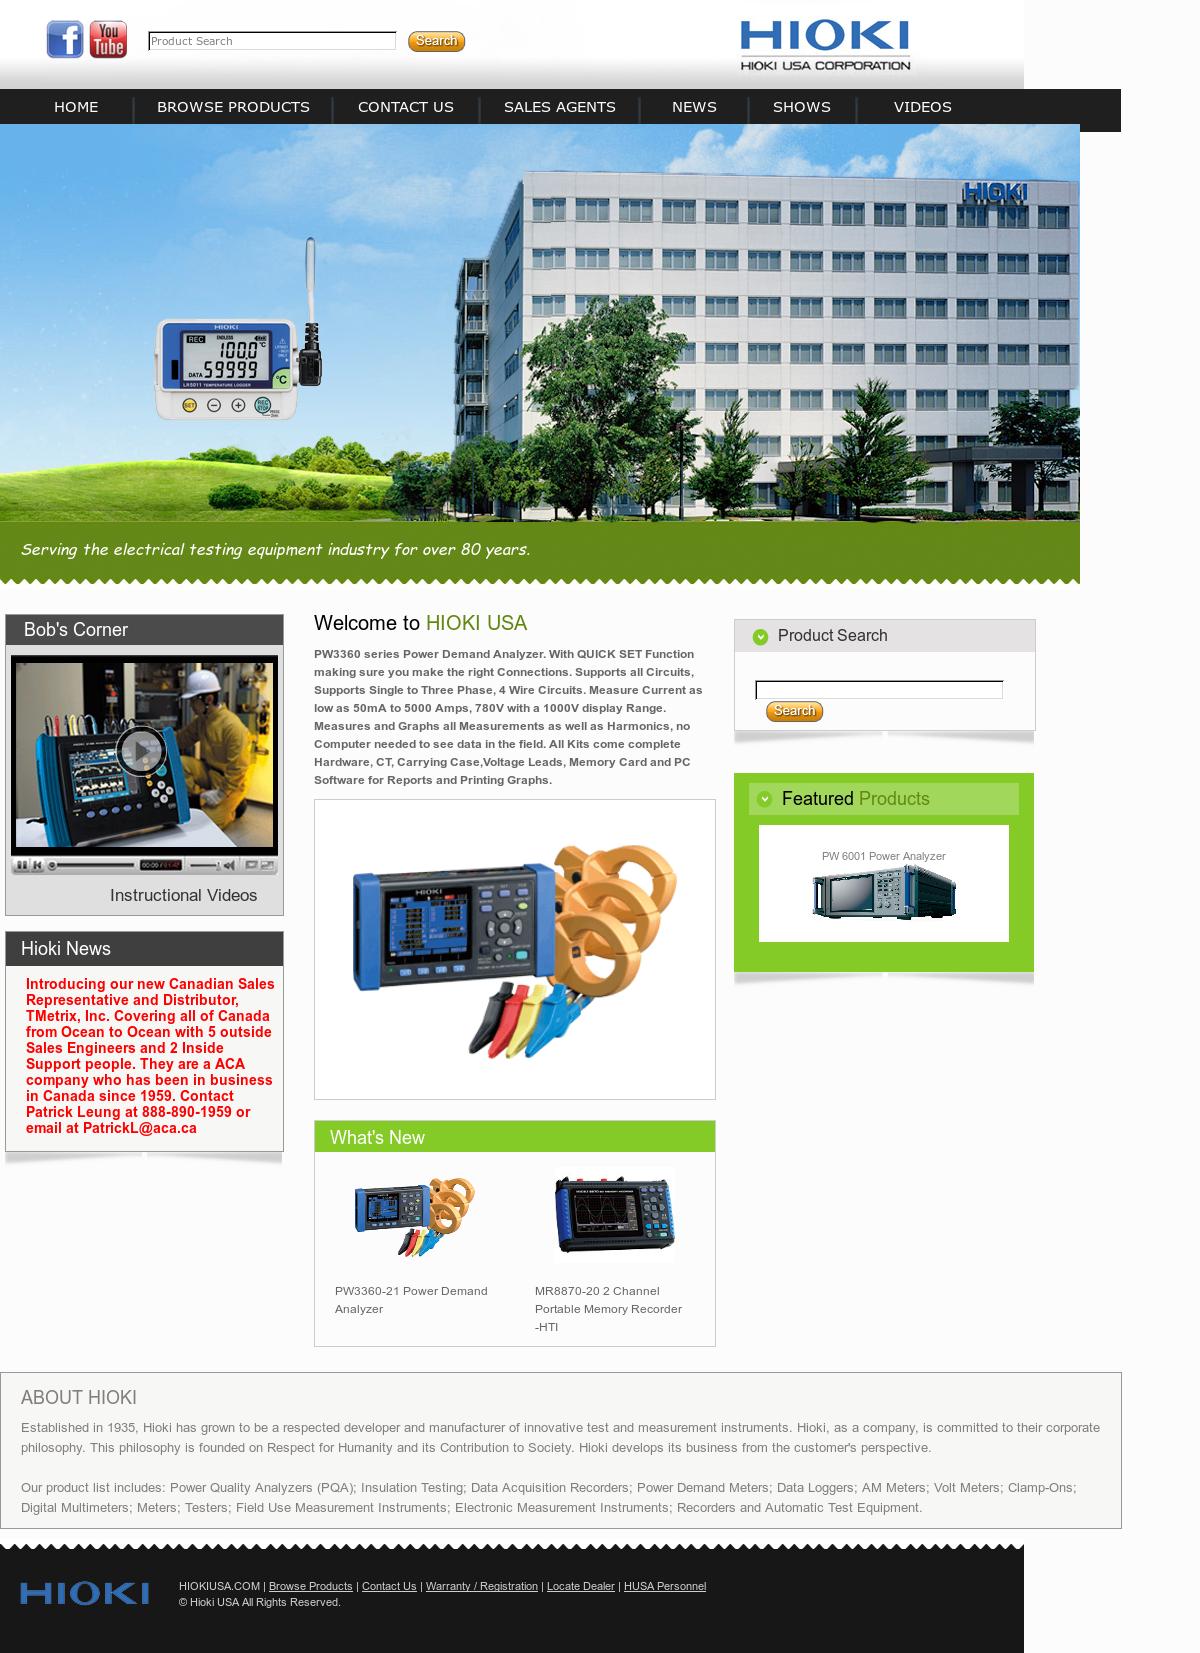 Hioki Usa Competitors, Revenue and Employees - Owler Company Profile